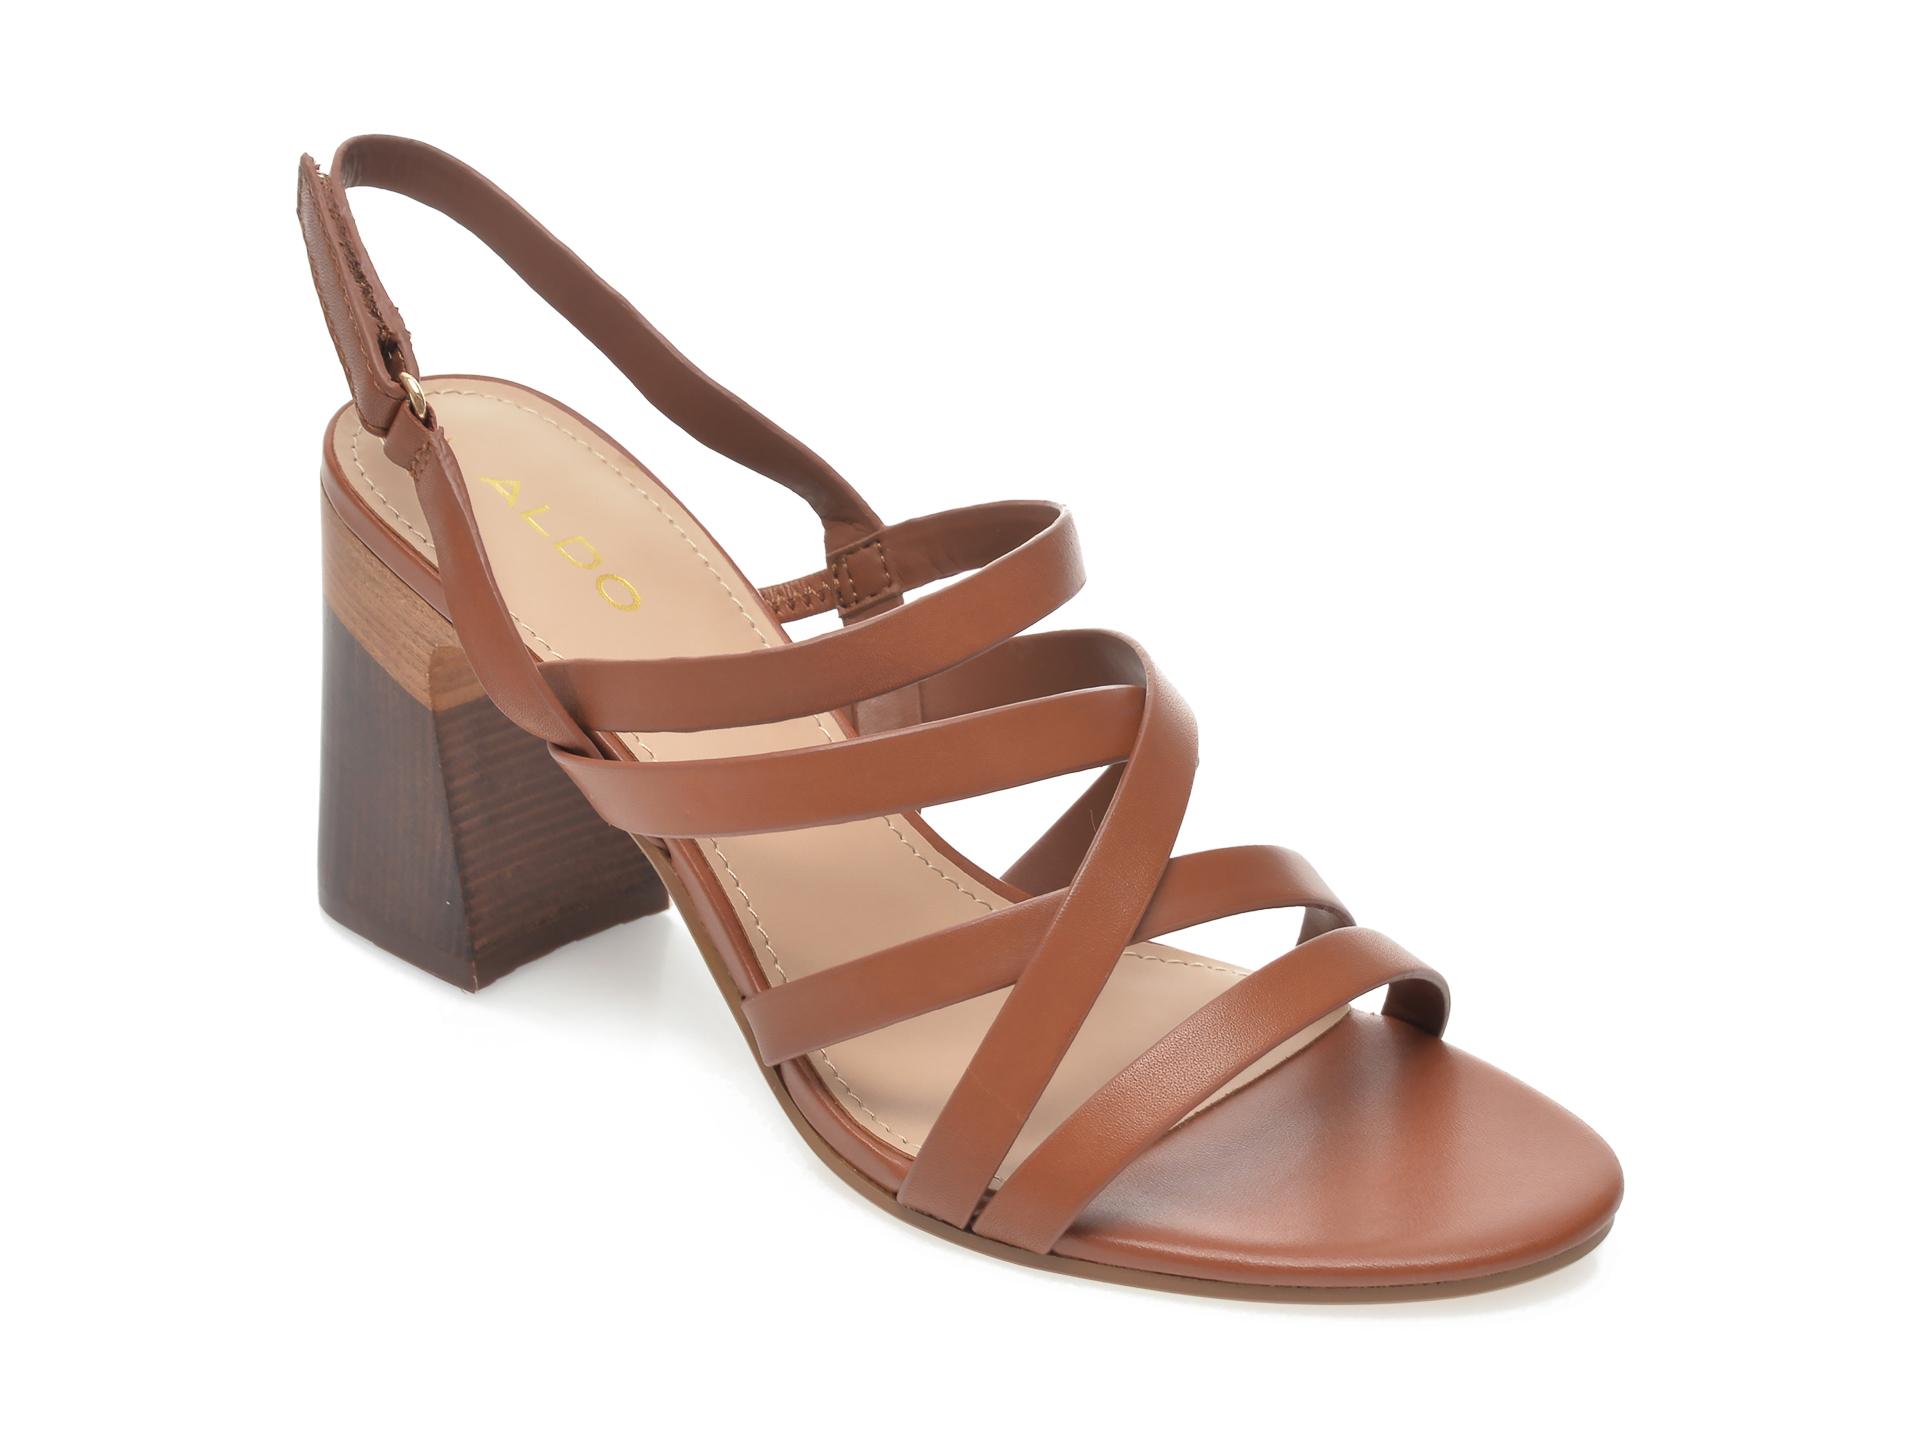 Sandale ALDO maro, Dindiloa220, din piele naturala imagine otter.ro